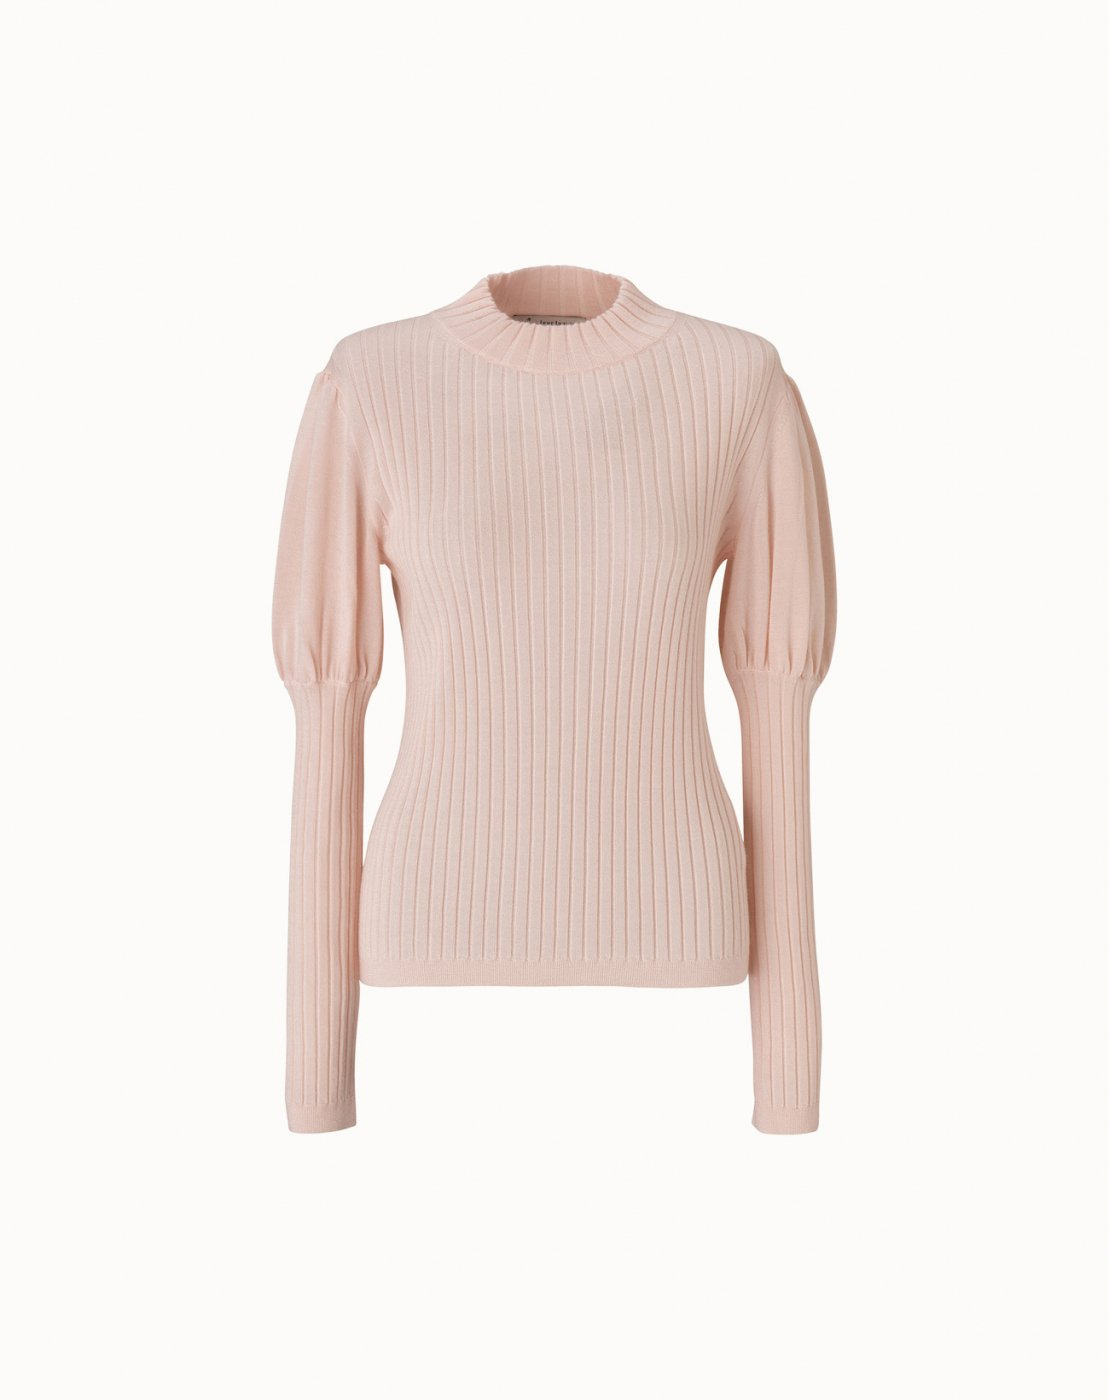 leur logette - Cashmere Silk Rib Top - Pink